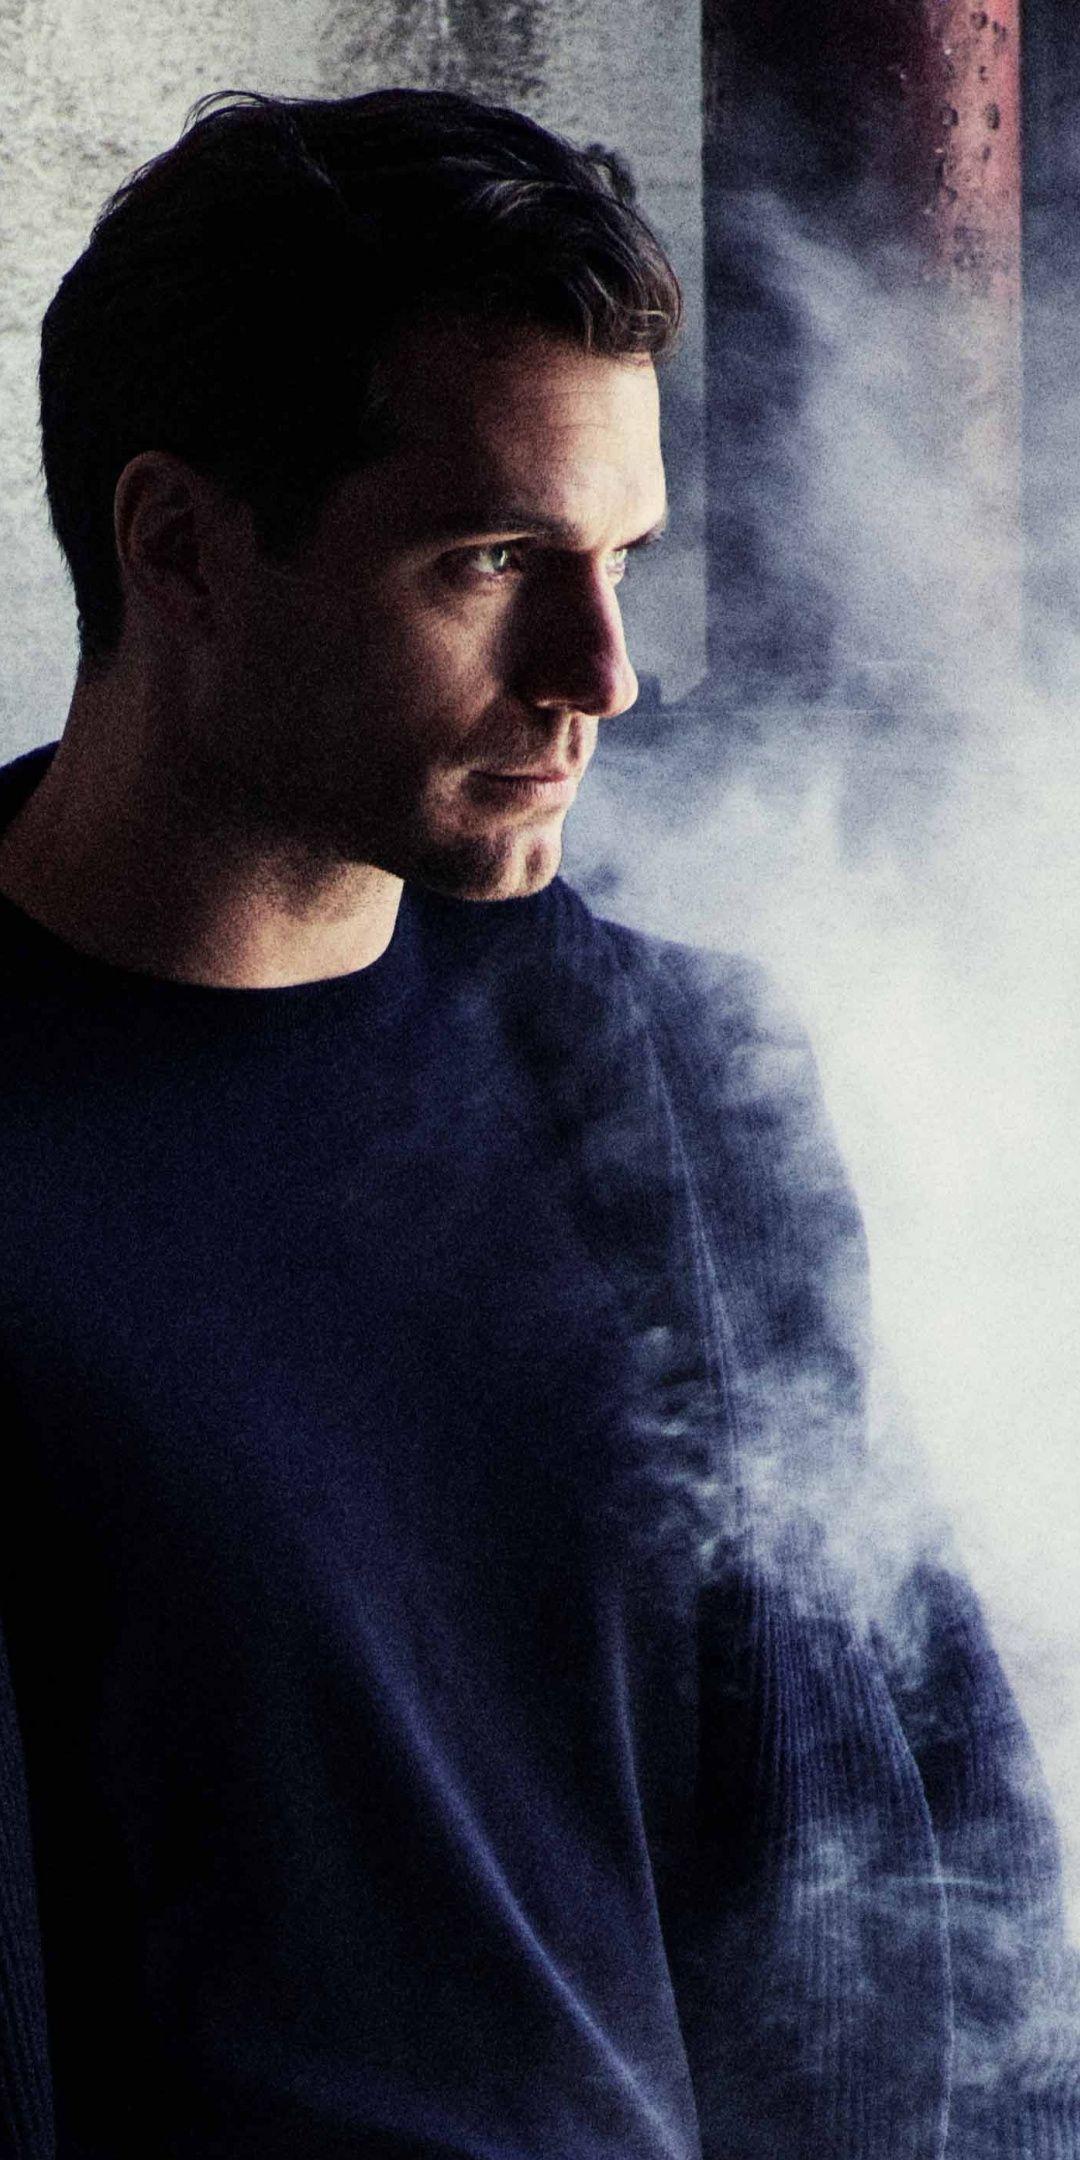 Henry Cavill Leaning To Wall Smoke Photoshoot 1080x2160